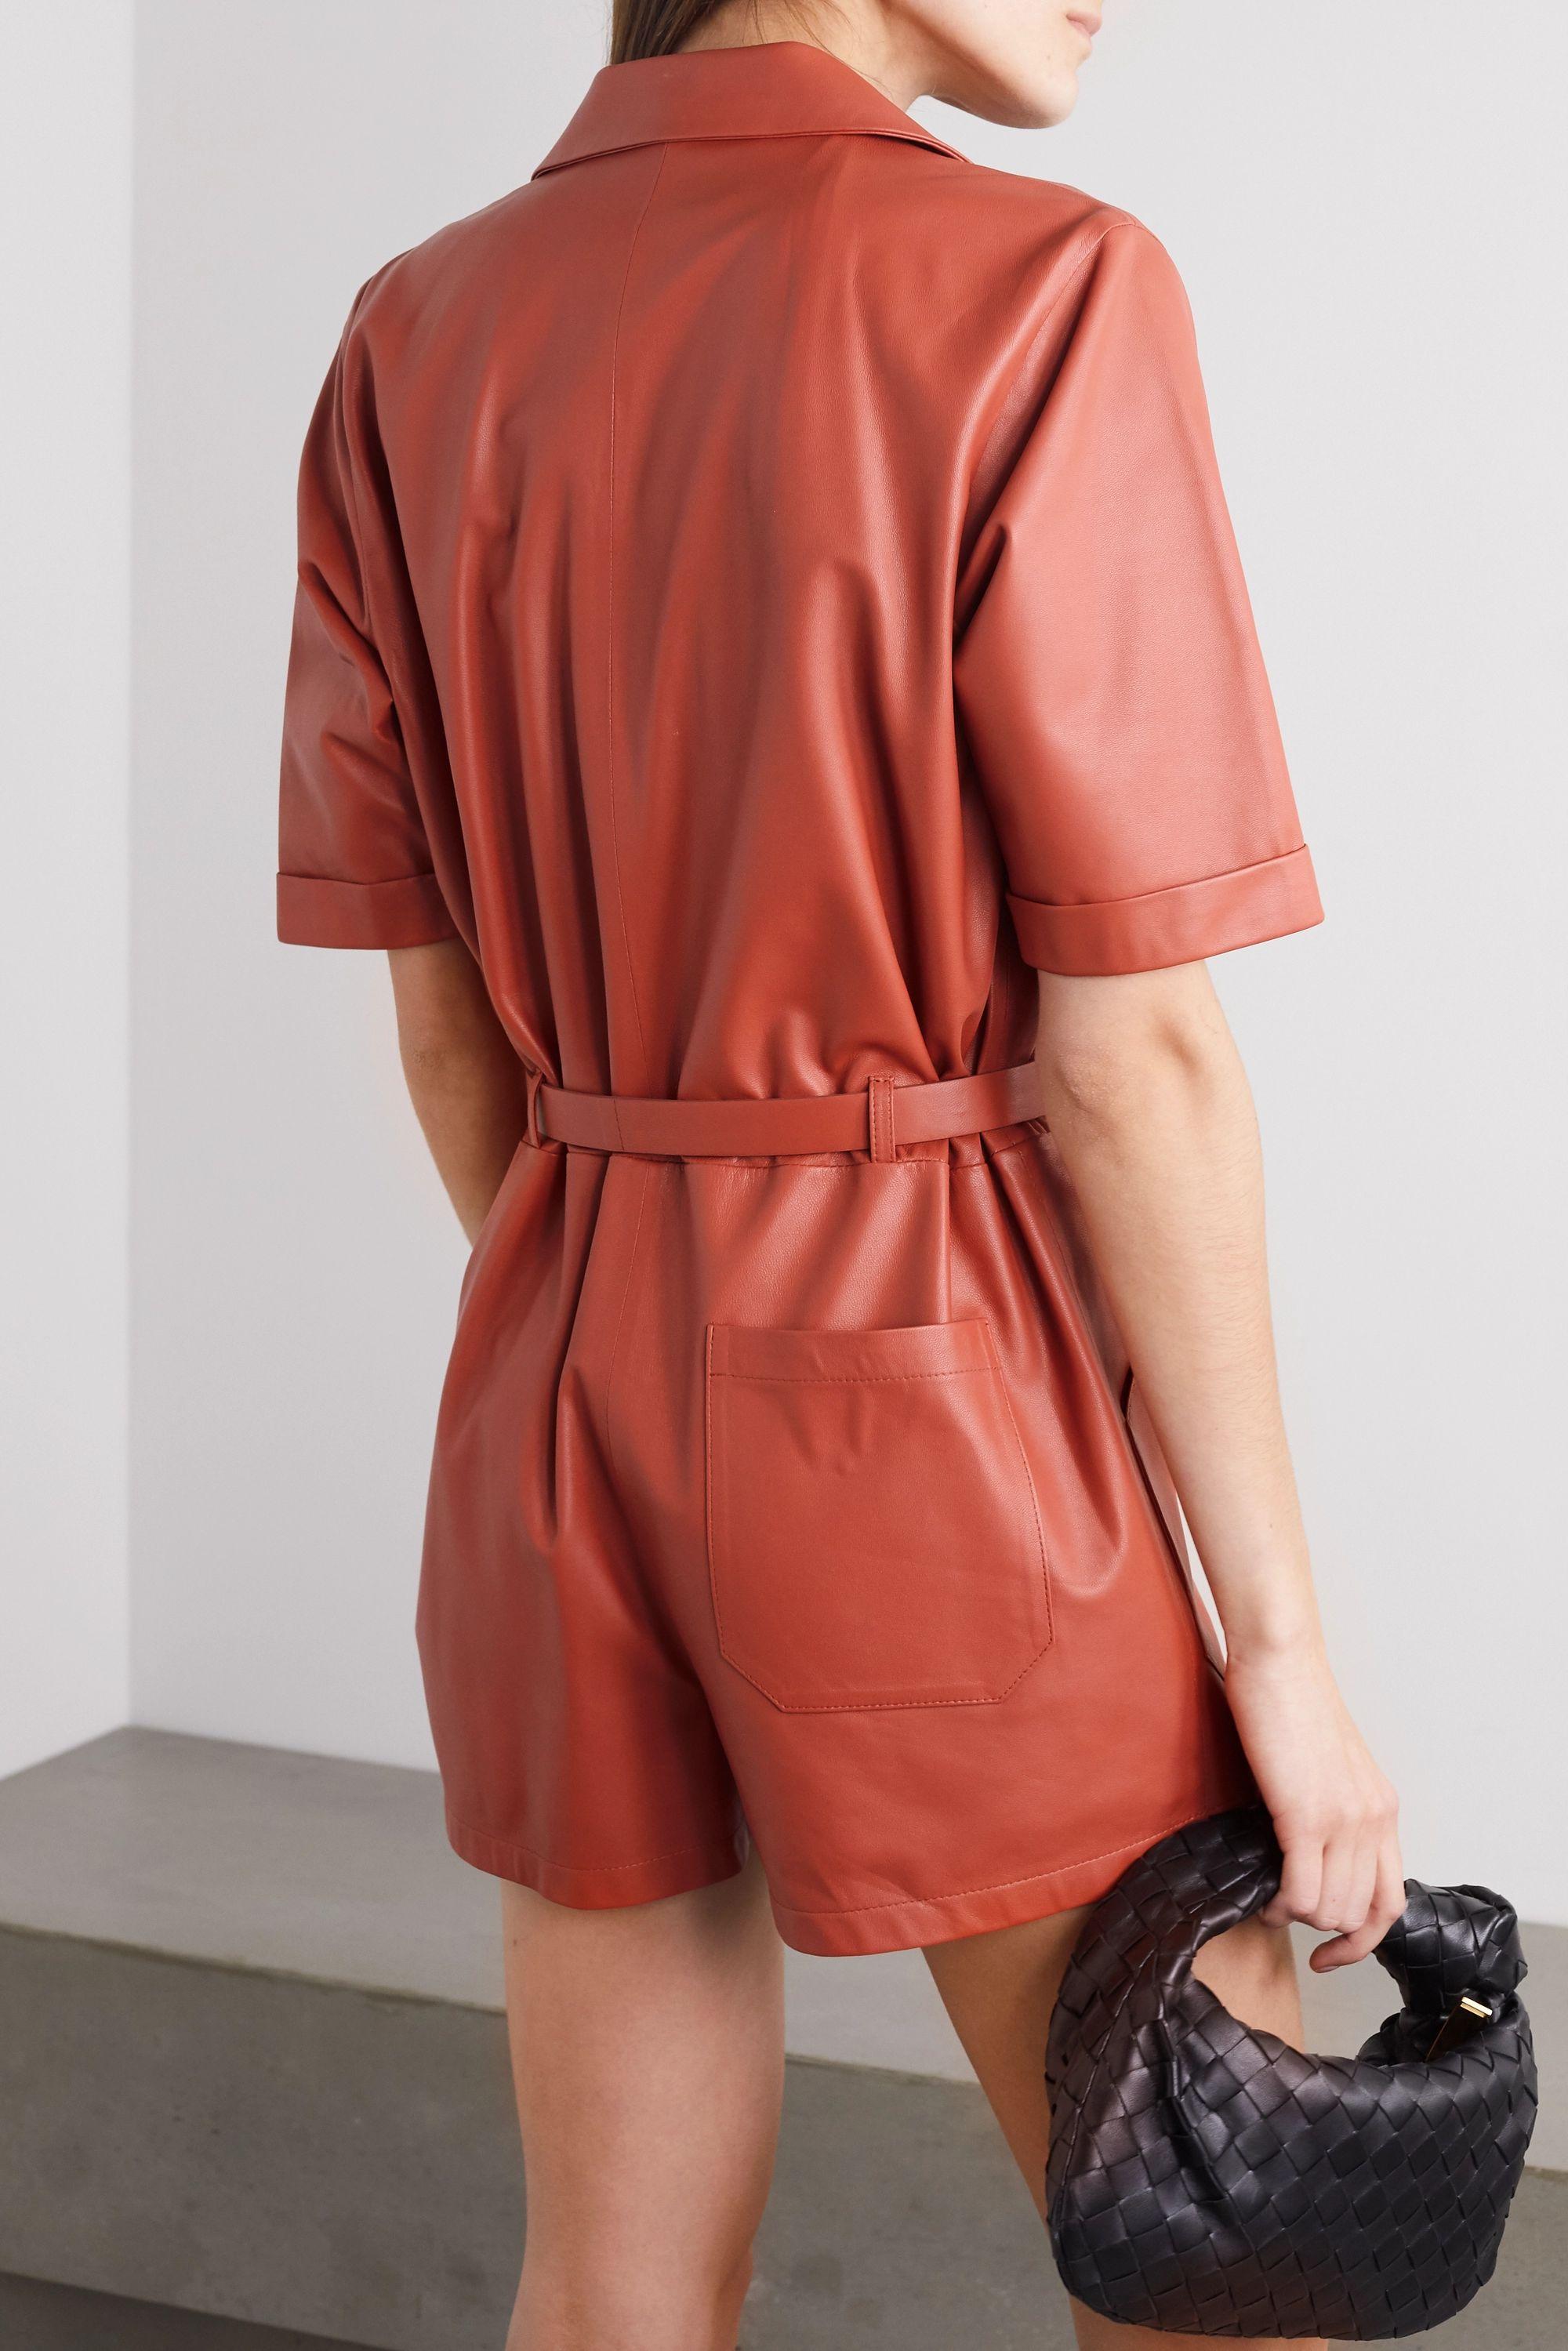 Zeynep Arcay Playsuit aus Leder mit Gürtel